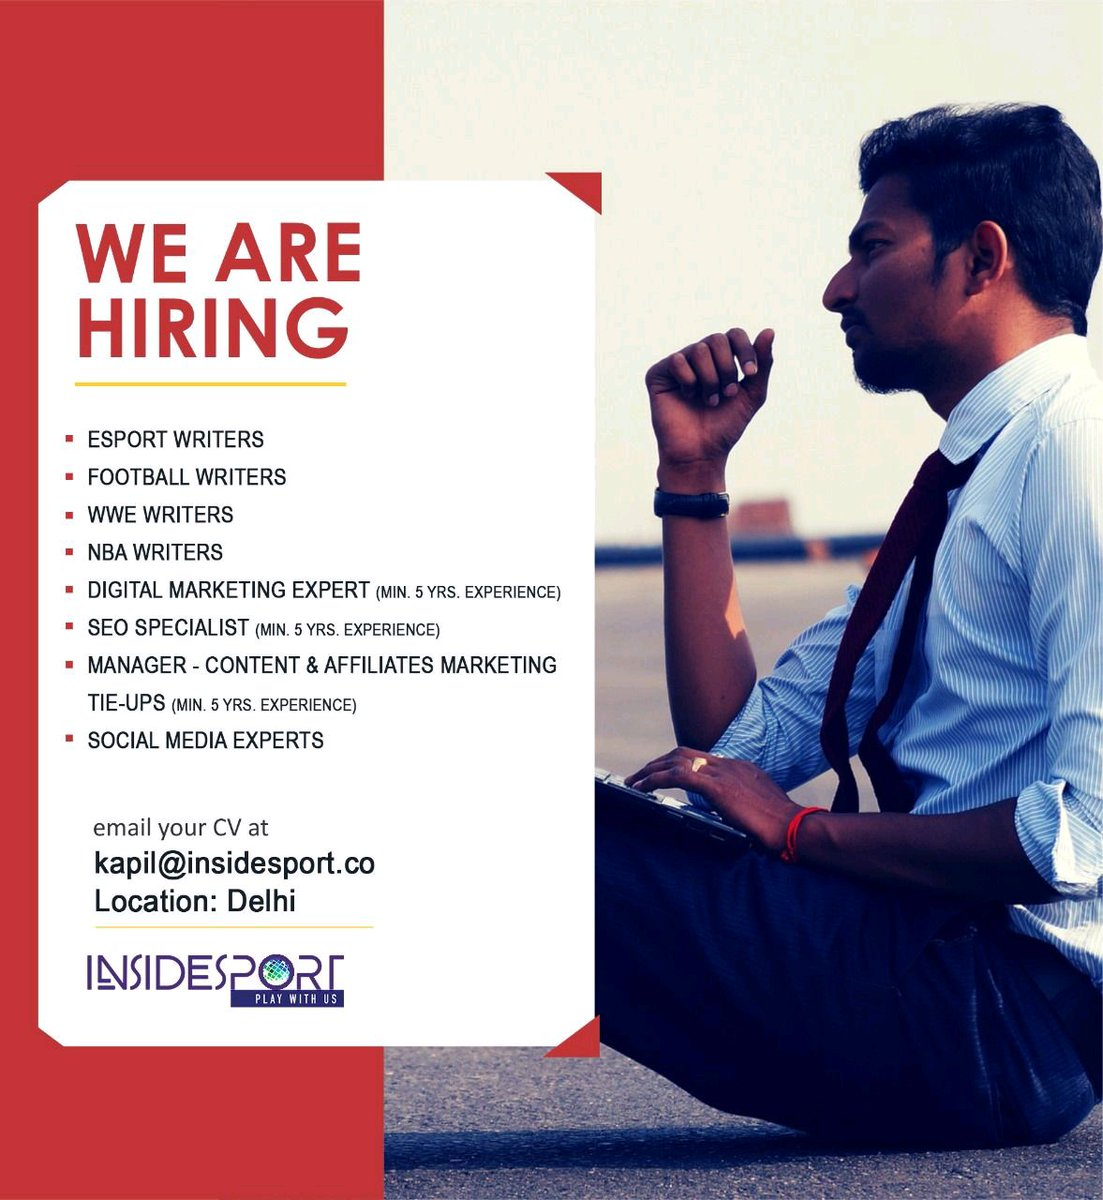 #JobAlert 26 @InsideSportIND #esportwriters #footballwriters #wwewriters #footballnews #esportsnews #wwe #nbanews #nbawriters #digitalmarketingjob #seospecialists #socialmediaexperts #delhi #hiringnow #hiringalert https://t.co/4tAb7oKkCn